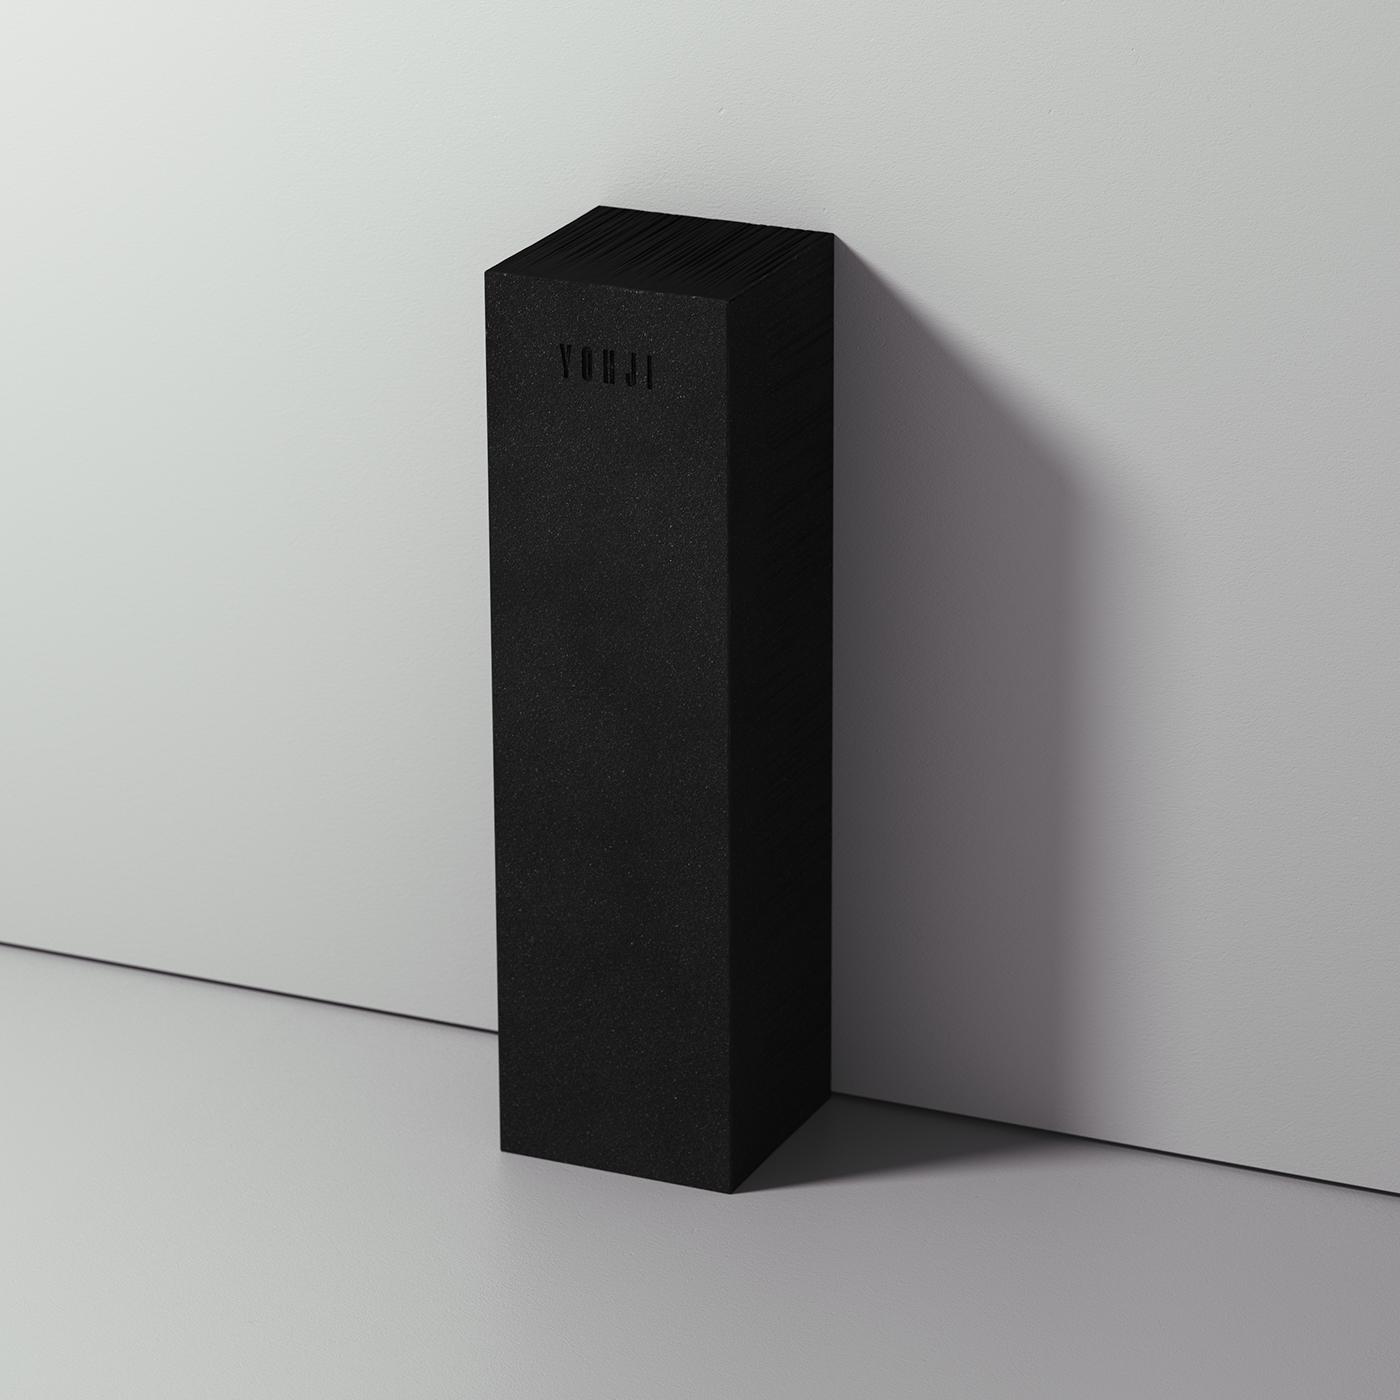 perfume,yohji yamamoto,Packaging,message,DNA,deconstruction,darkness,Paradox,avant-garde,niche